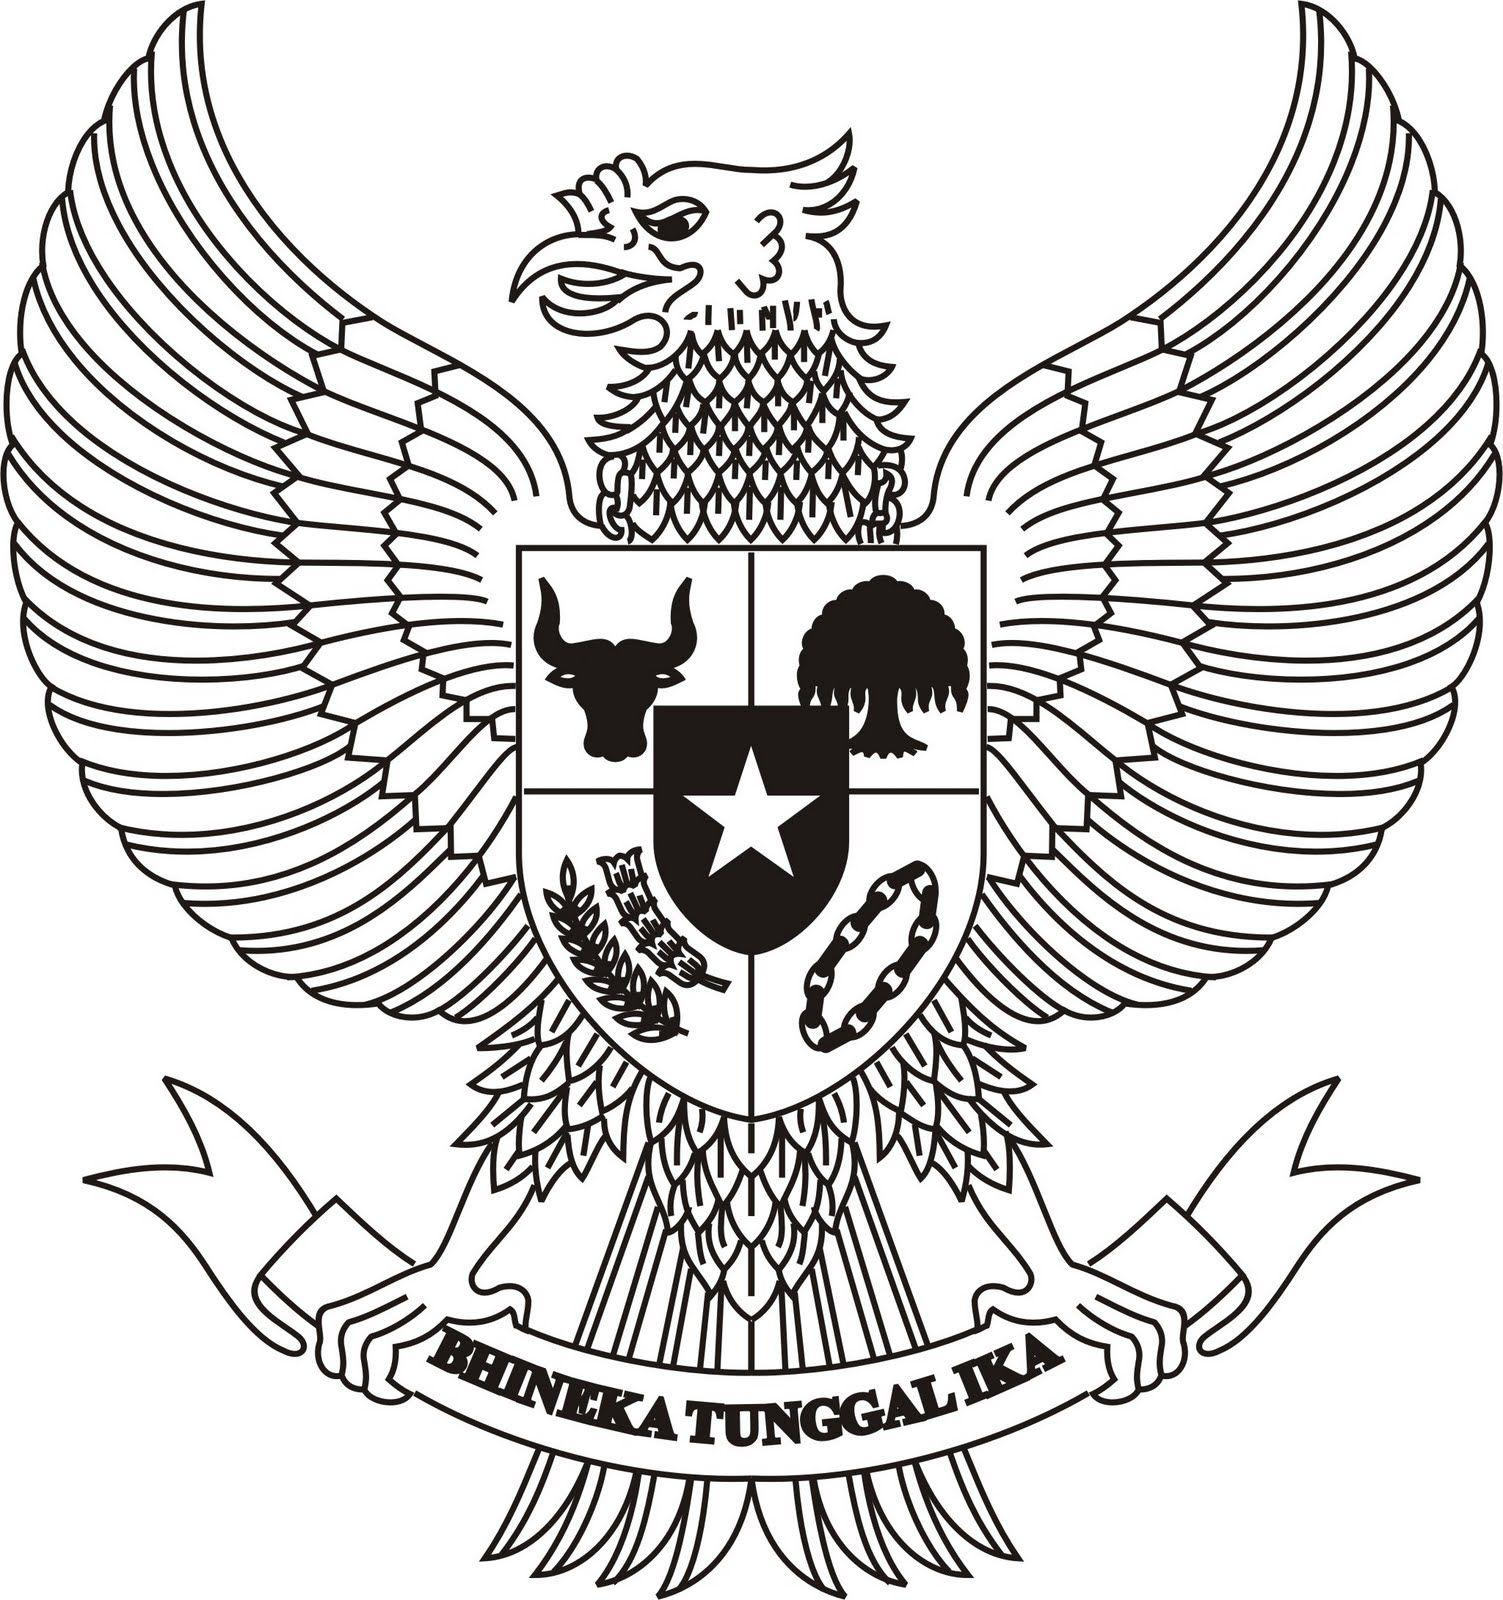 burung #garuda #indonesia di 2019.